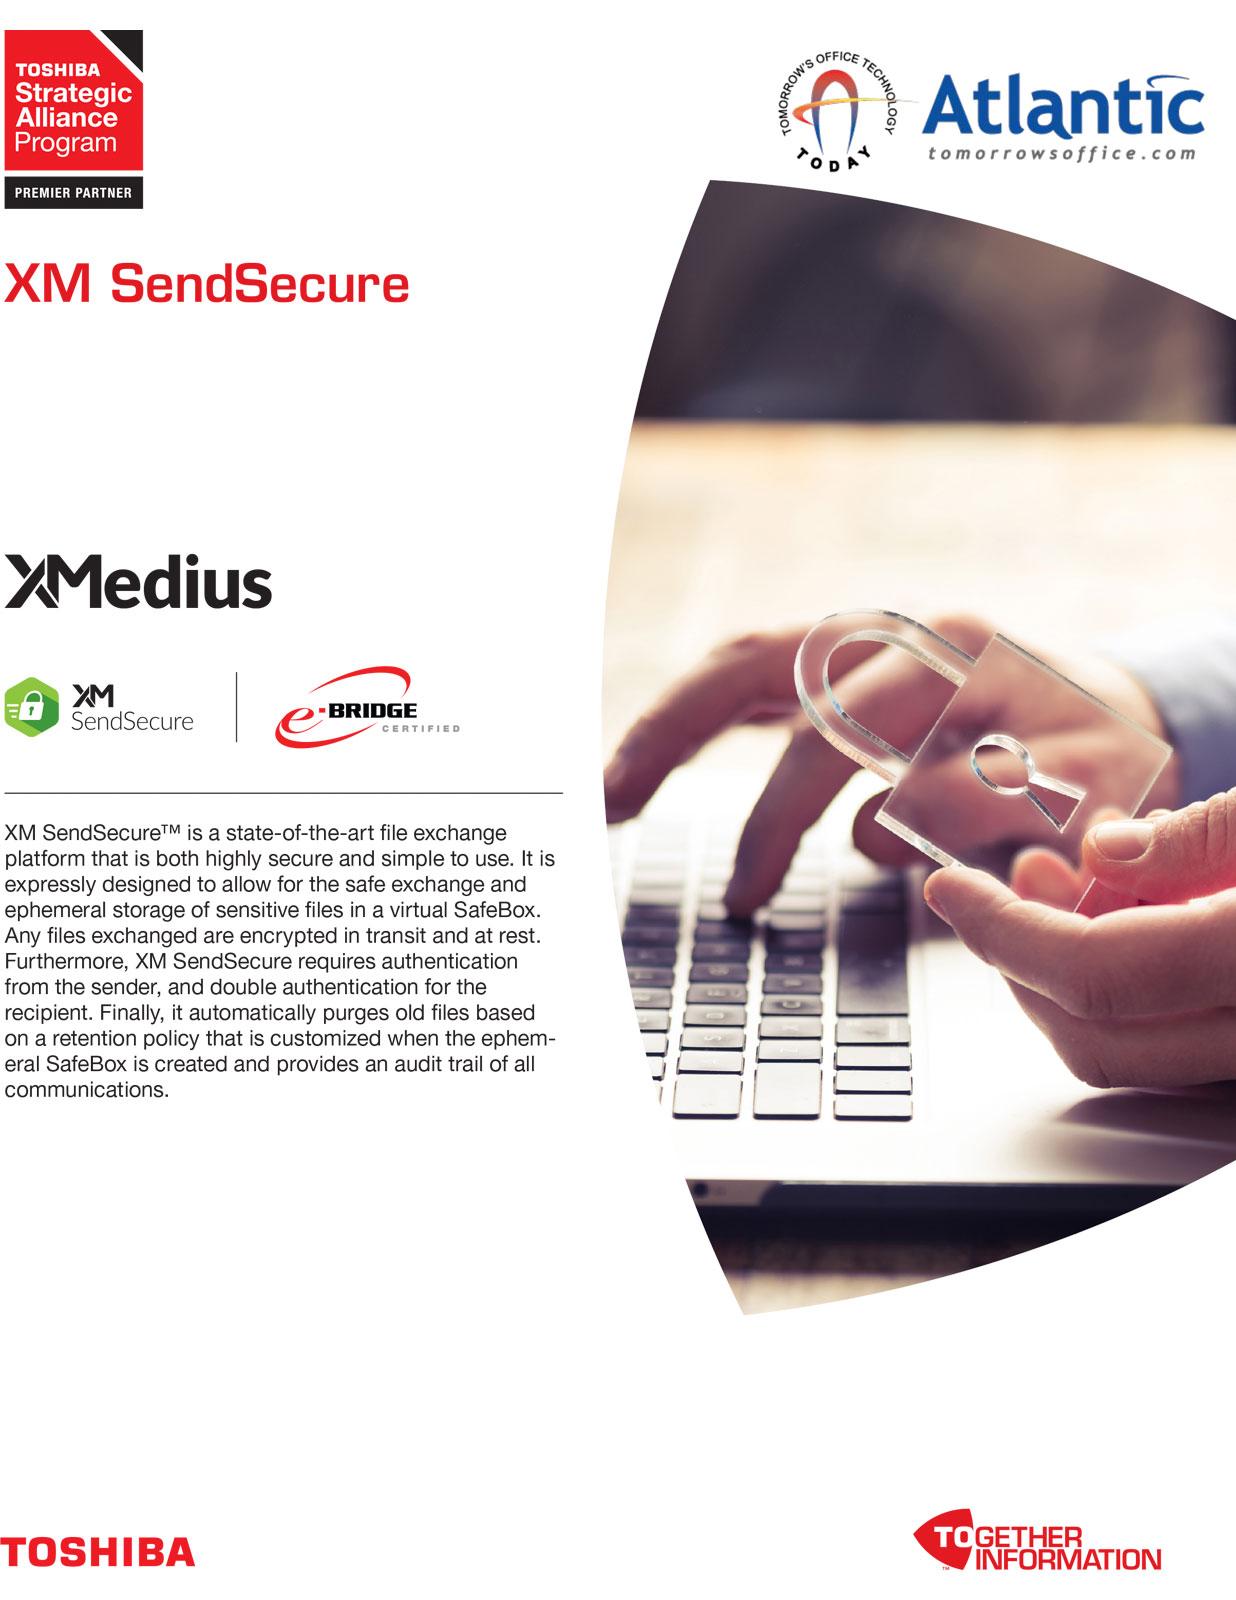 XM Fax Cloud XMedius